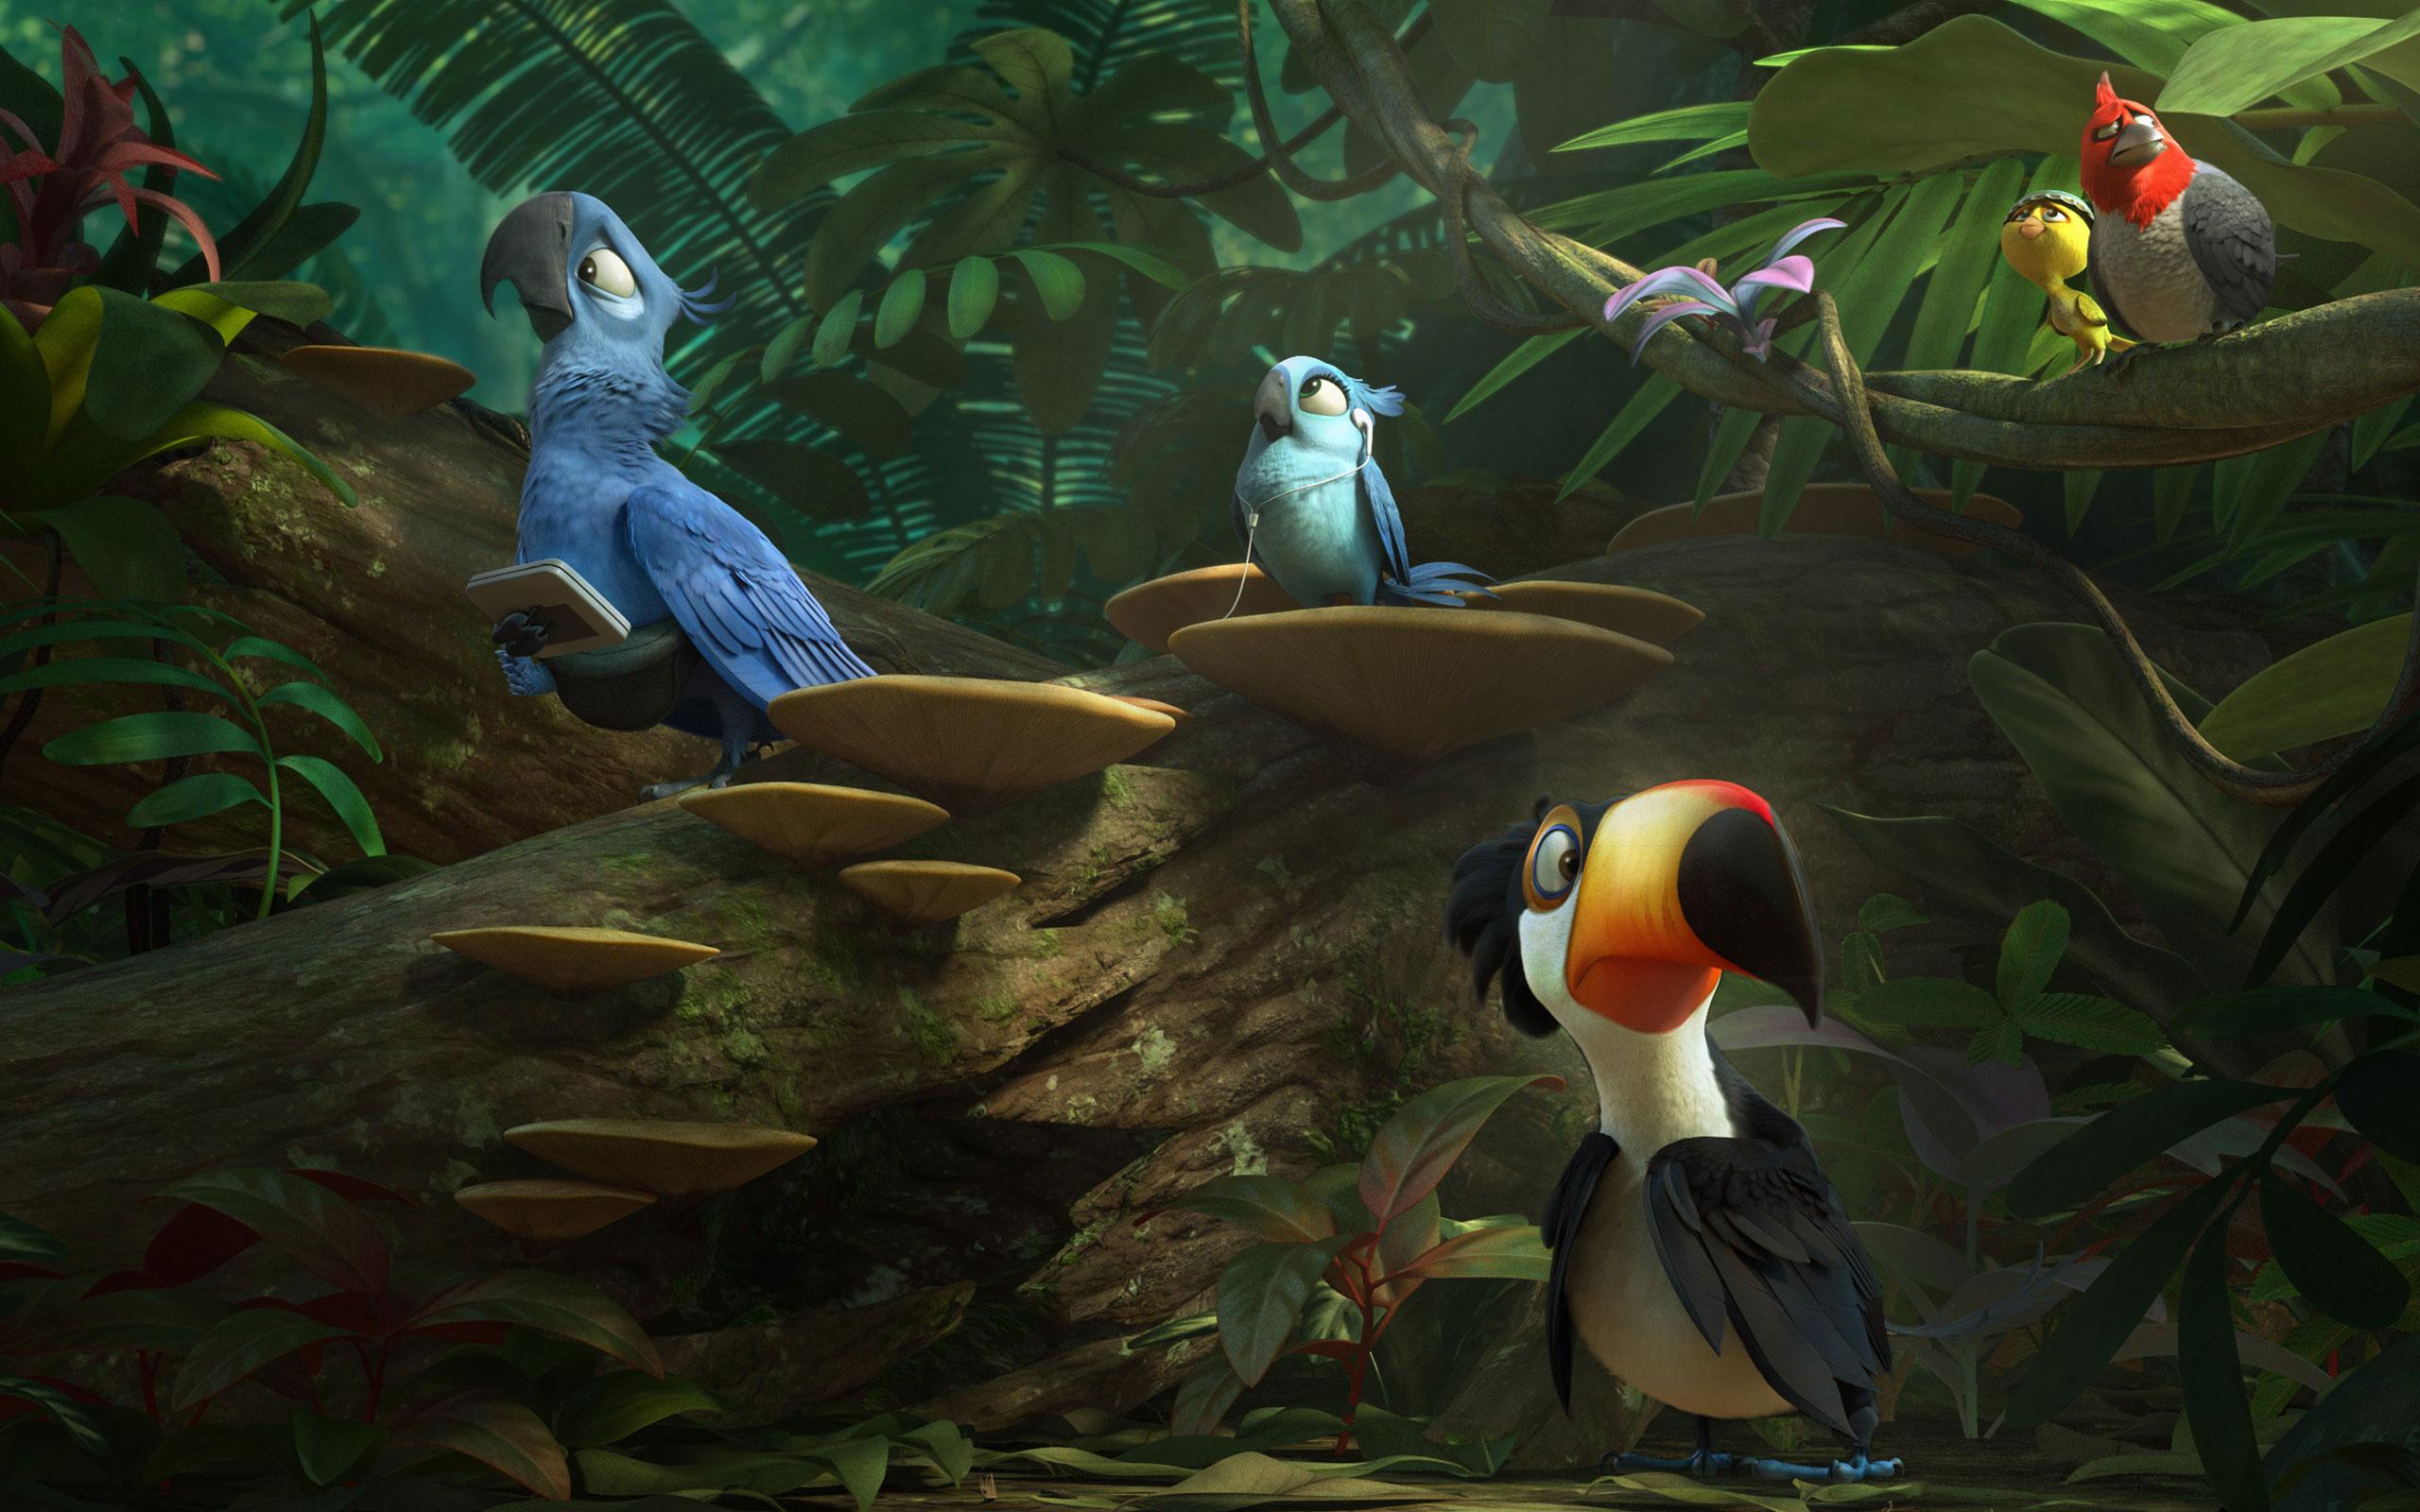 Movie Wallpapers Desktop Backgrounds Rio 2 2014 Movie HD Movie 2560x1600